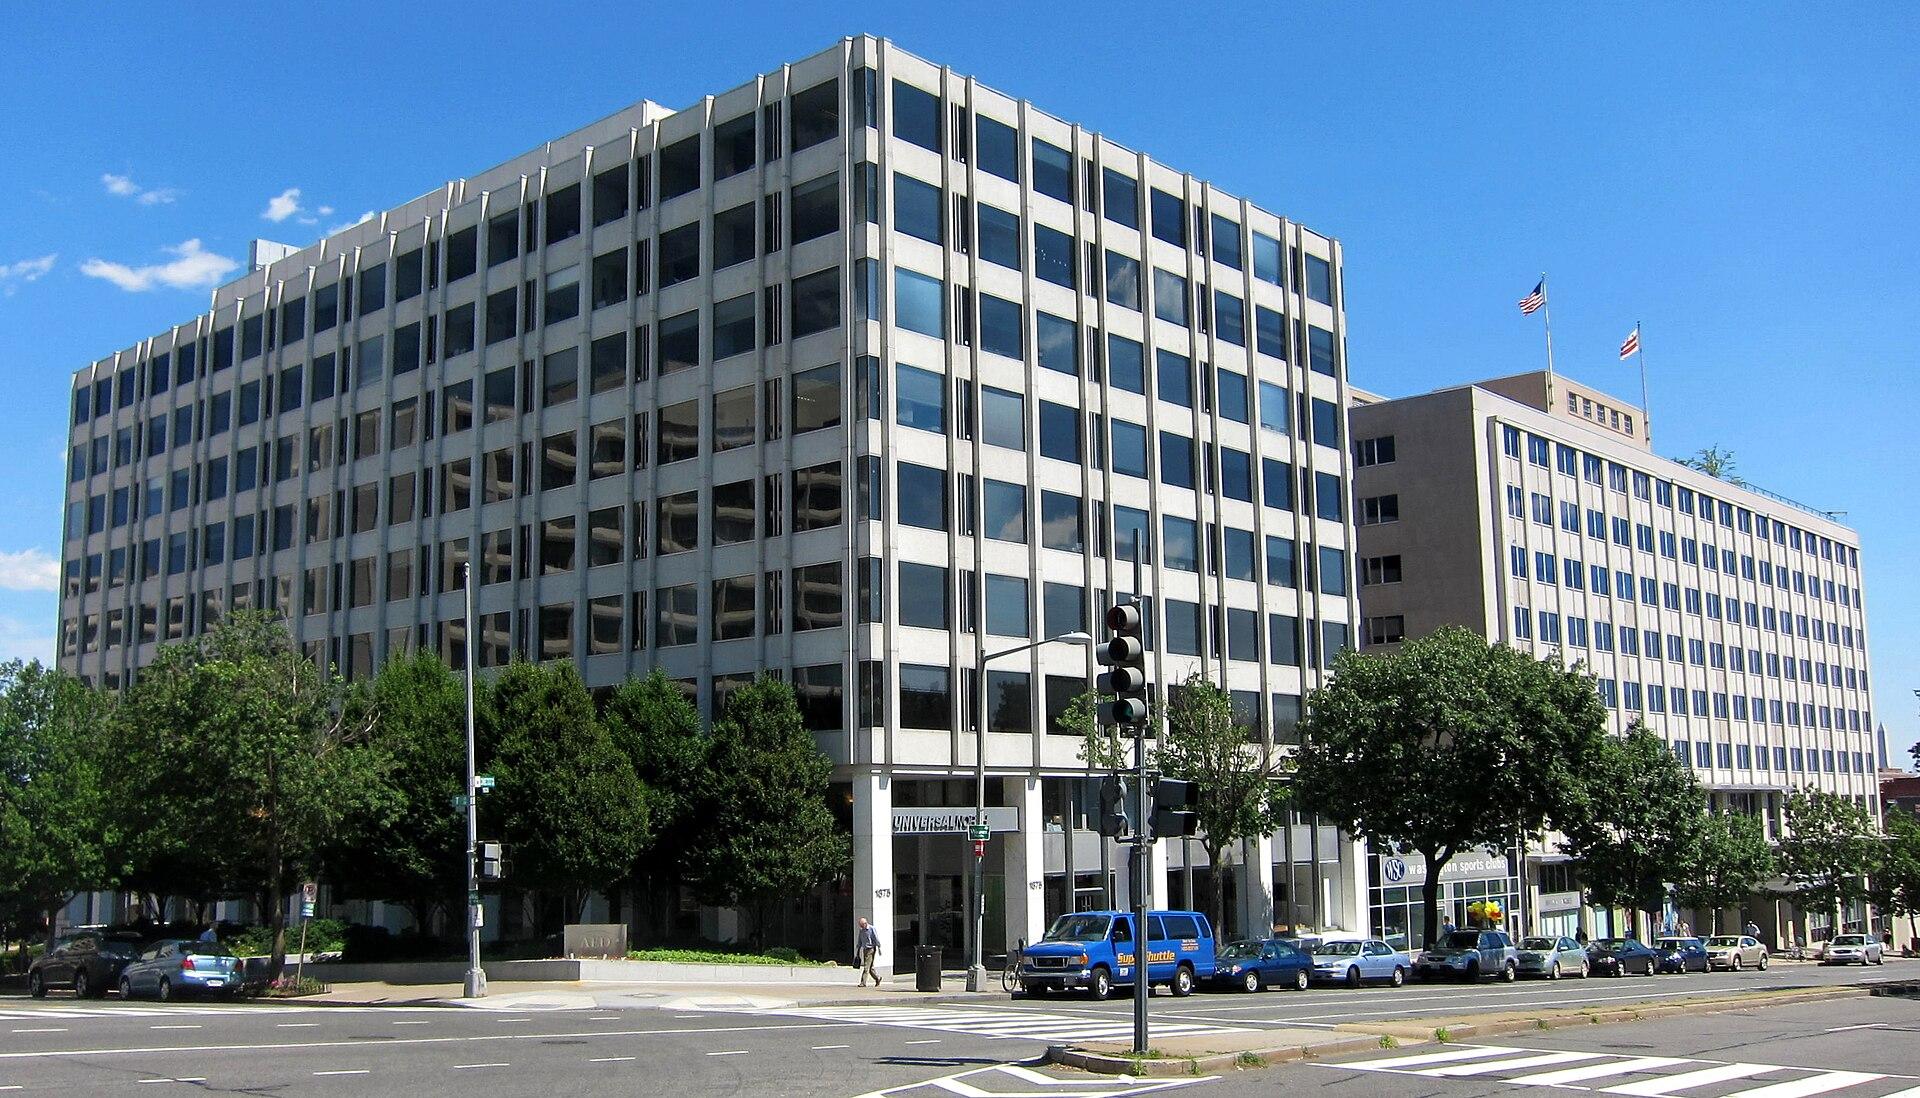 Population reference bureau wikipedia - National bank of pakistan head office ...